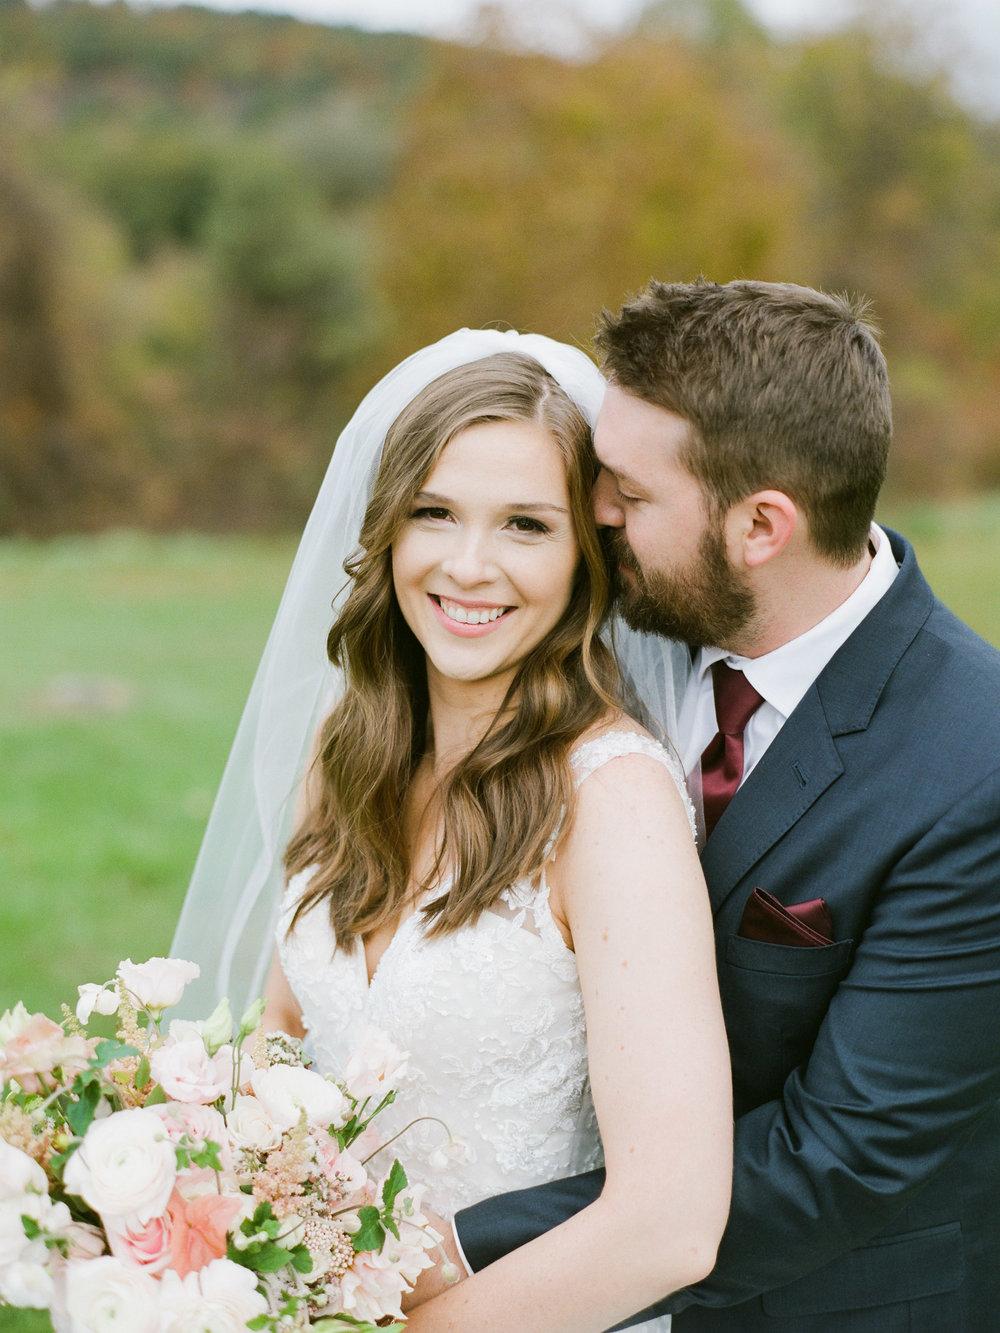 Autumn New England Wedding in Northampton MA